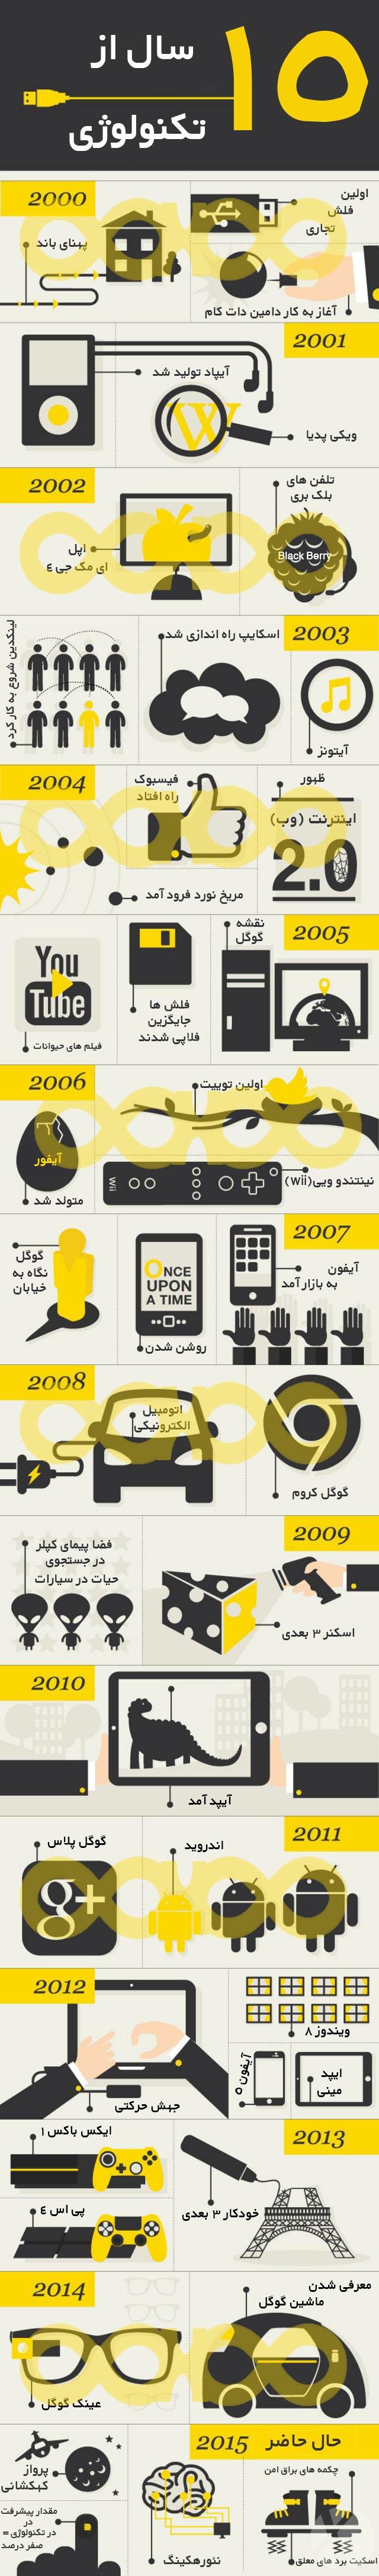 ۱۵-years-of-tech-1